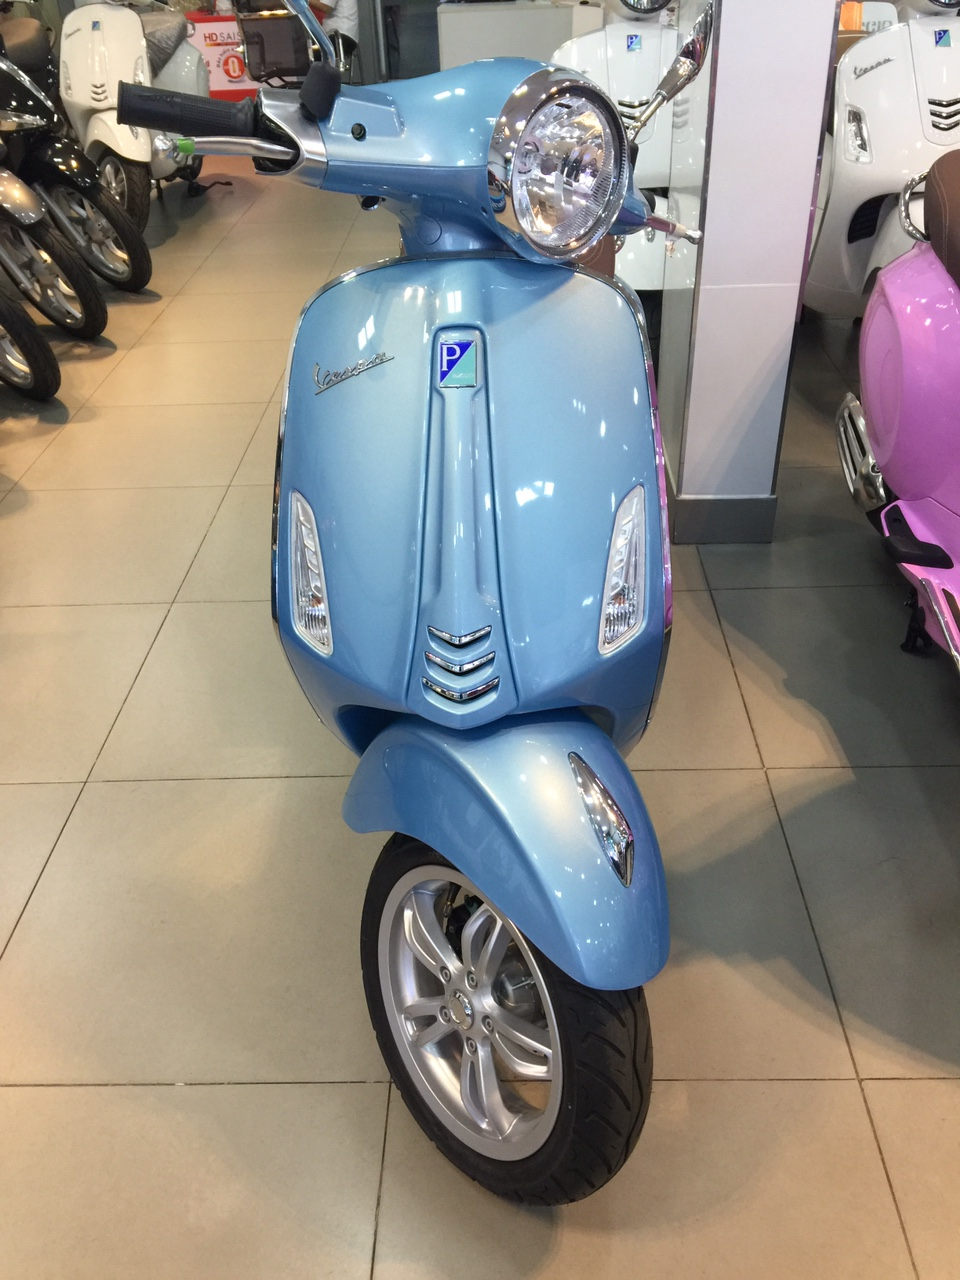 Mua xe Vespa Primavera 2017 tai HCM Chuong trinh Hot - 3